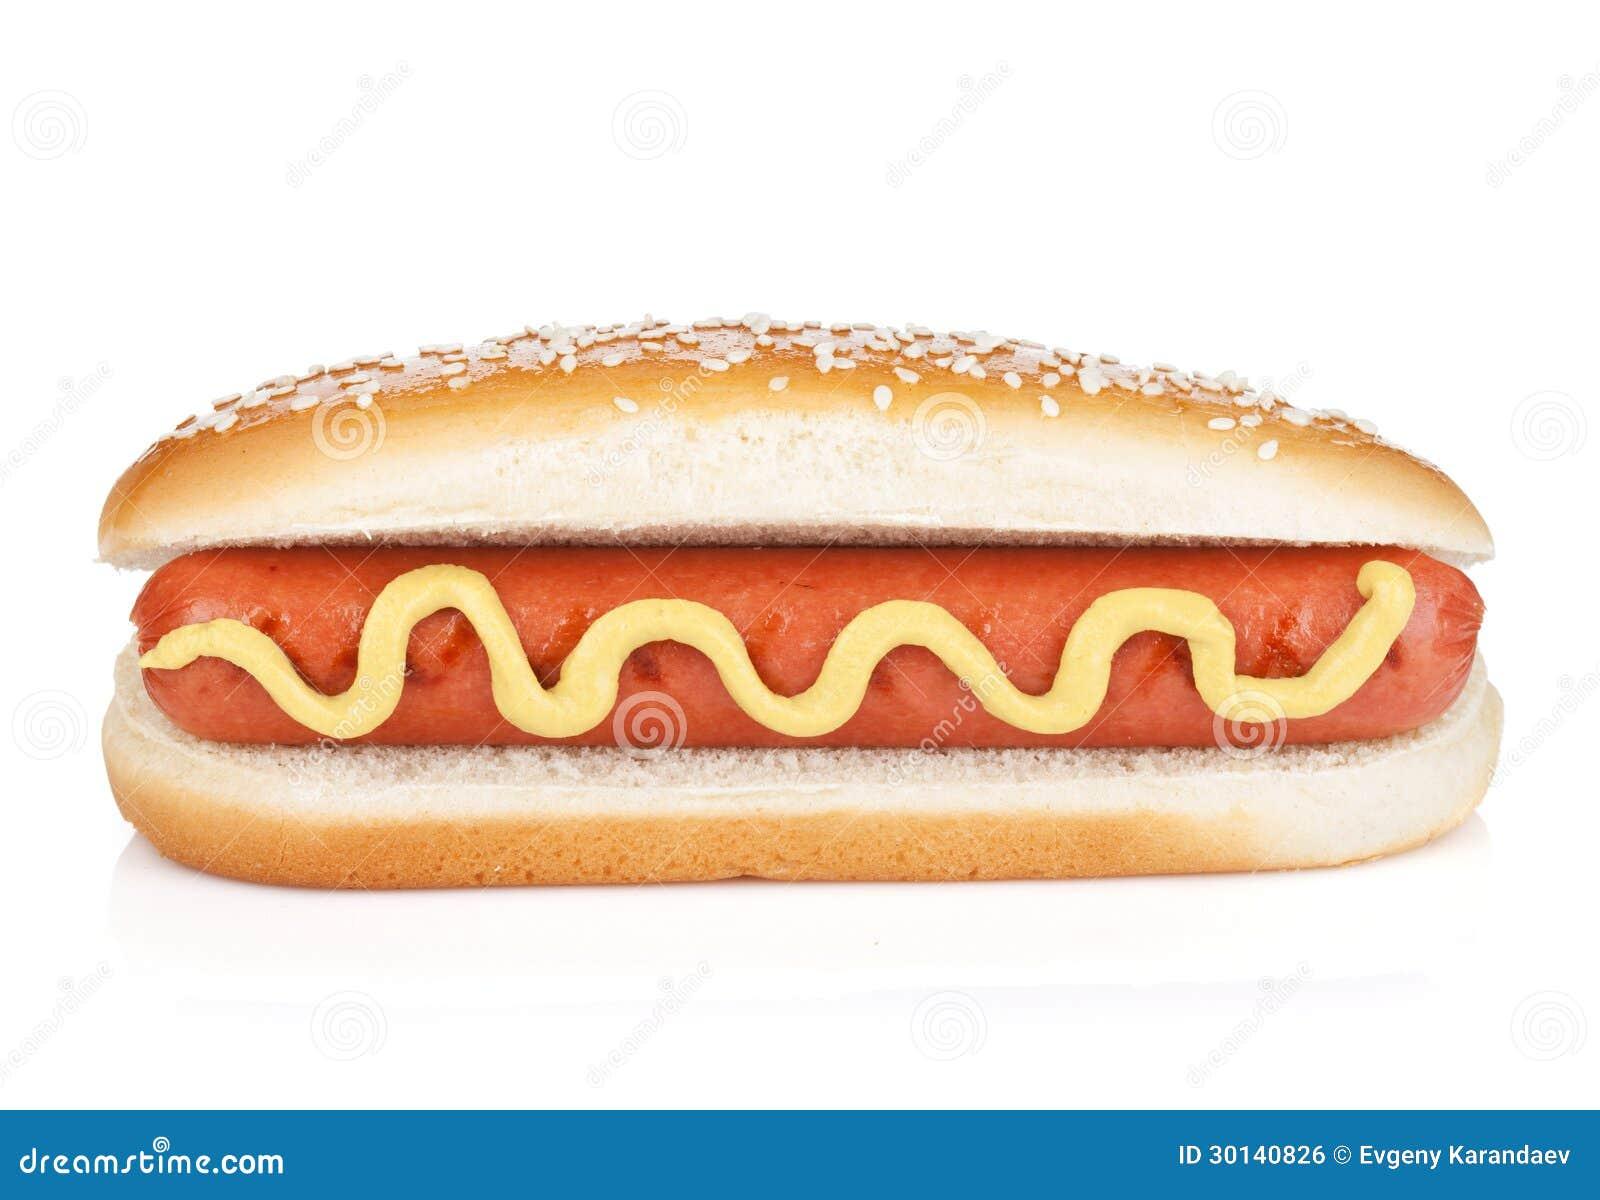 hot dog with mustard royalty free stock image image 30140826. Black Bedroom Furniture Sets. Home Design Ideas